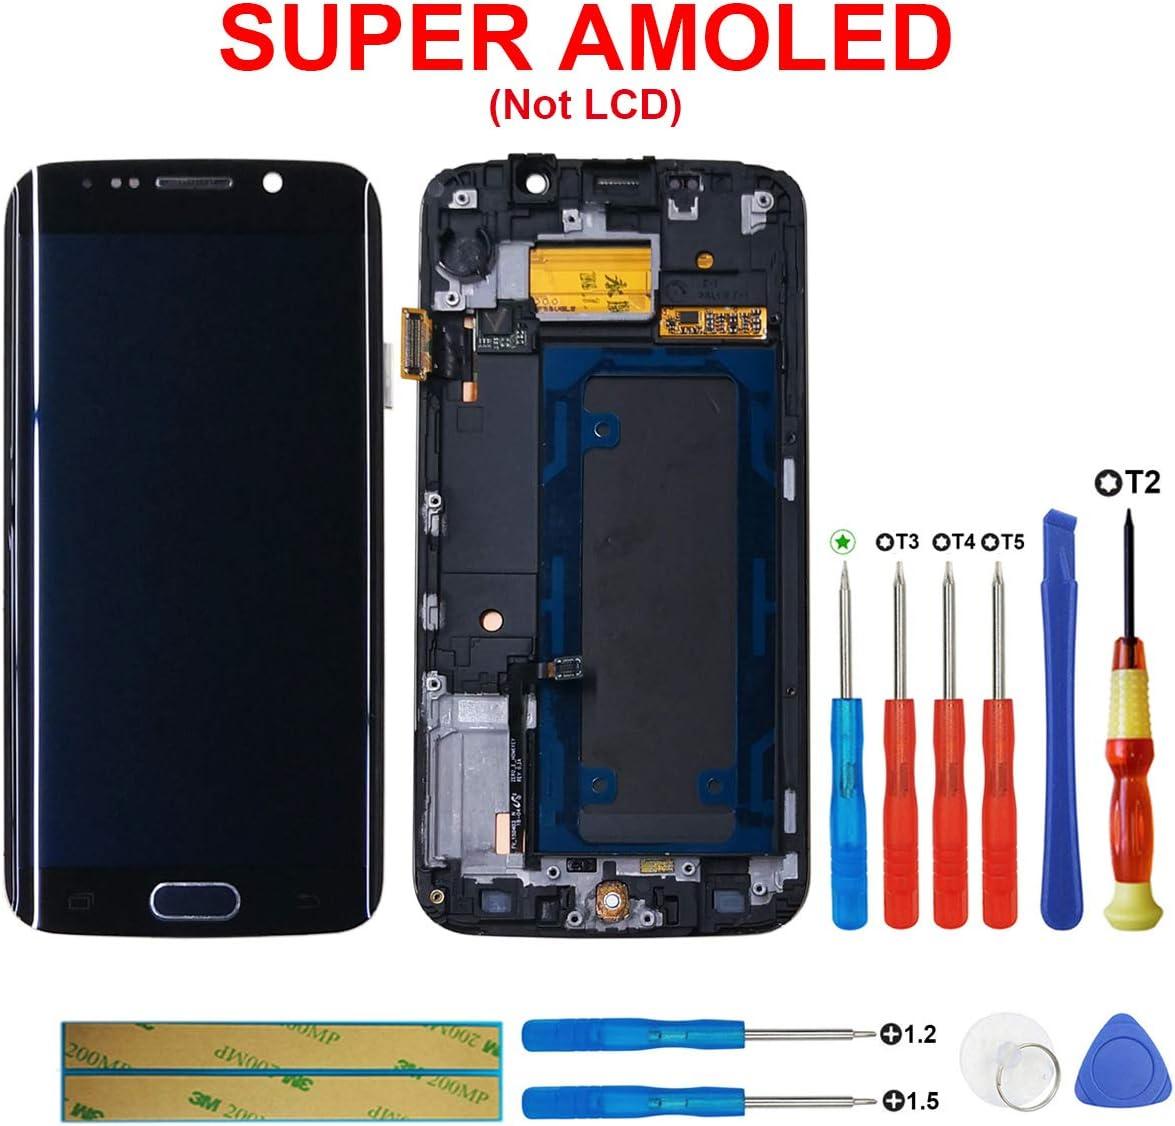 swark Super AMOLED Pantalla para Samsung Galaxy S6 Edge g925 F Touch Screen Marco Negro + Herramienta Opening Tools: Amazon.es: Electrónica